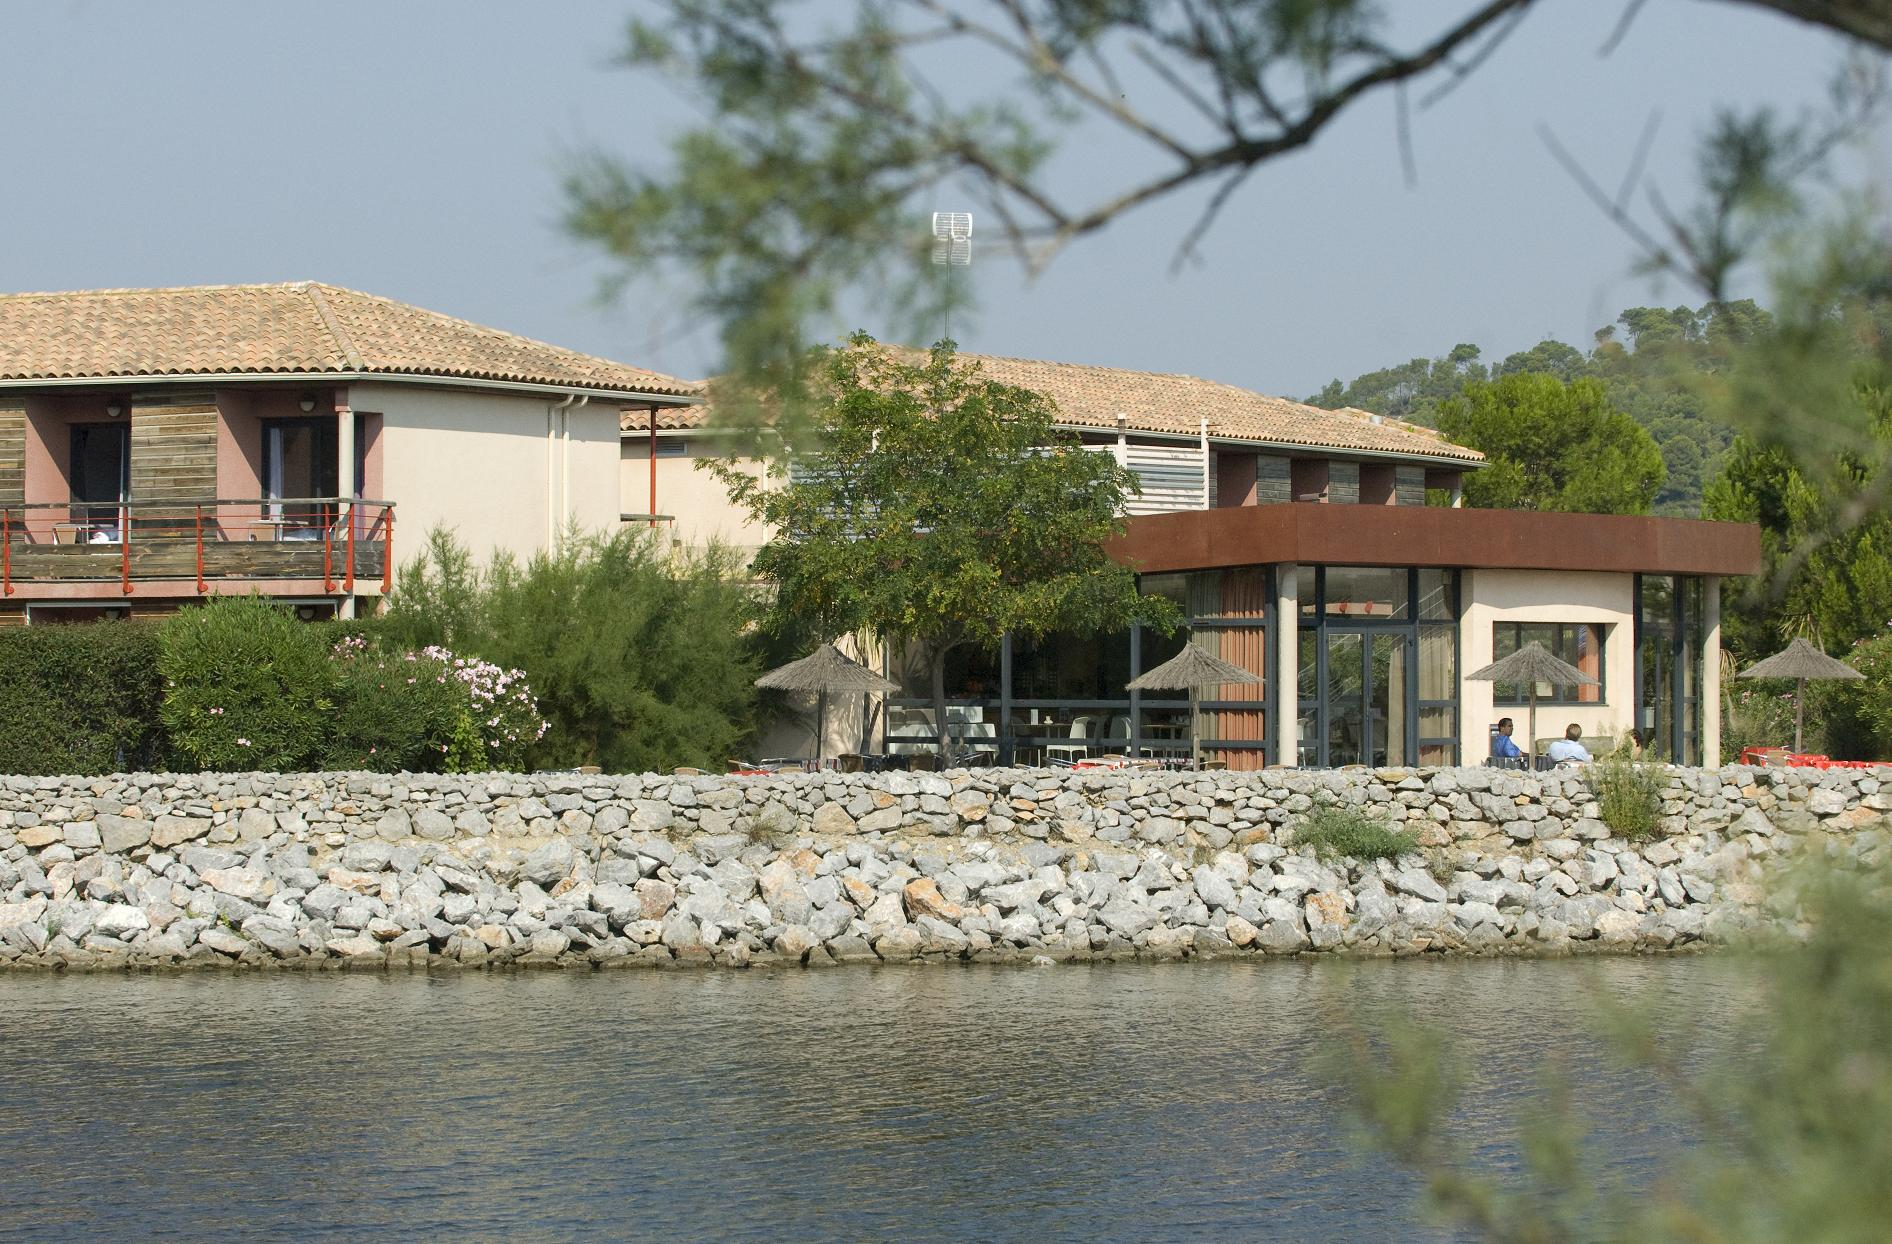 Marvelous Hotel Port Beach Gruissan Artwork Kvazarinfo - Hotel port beach gruissan